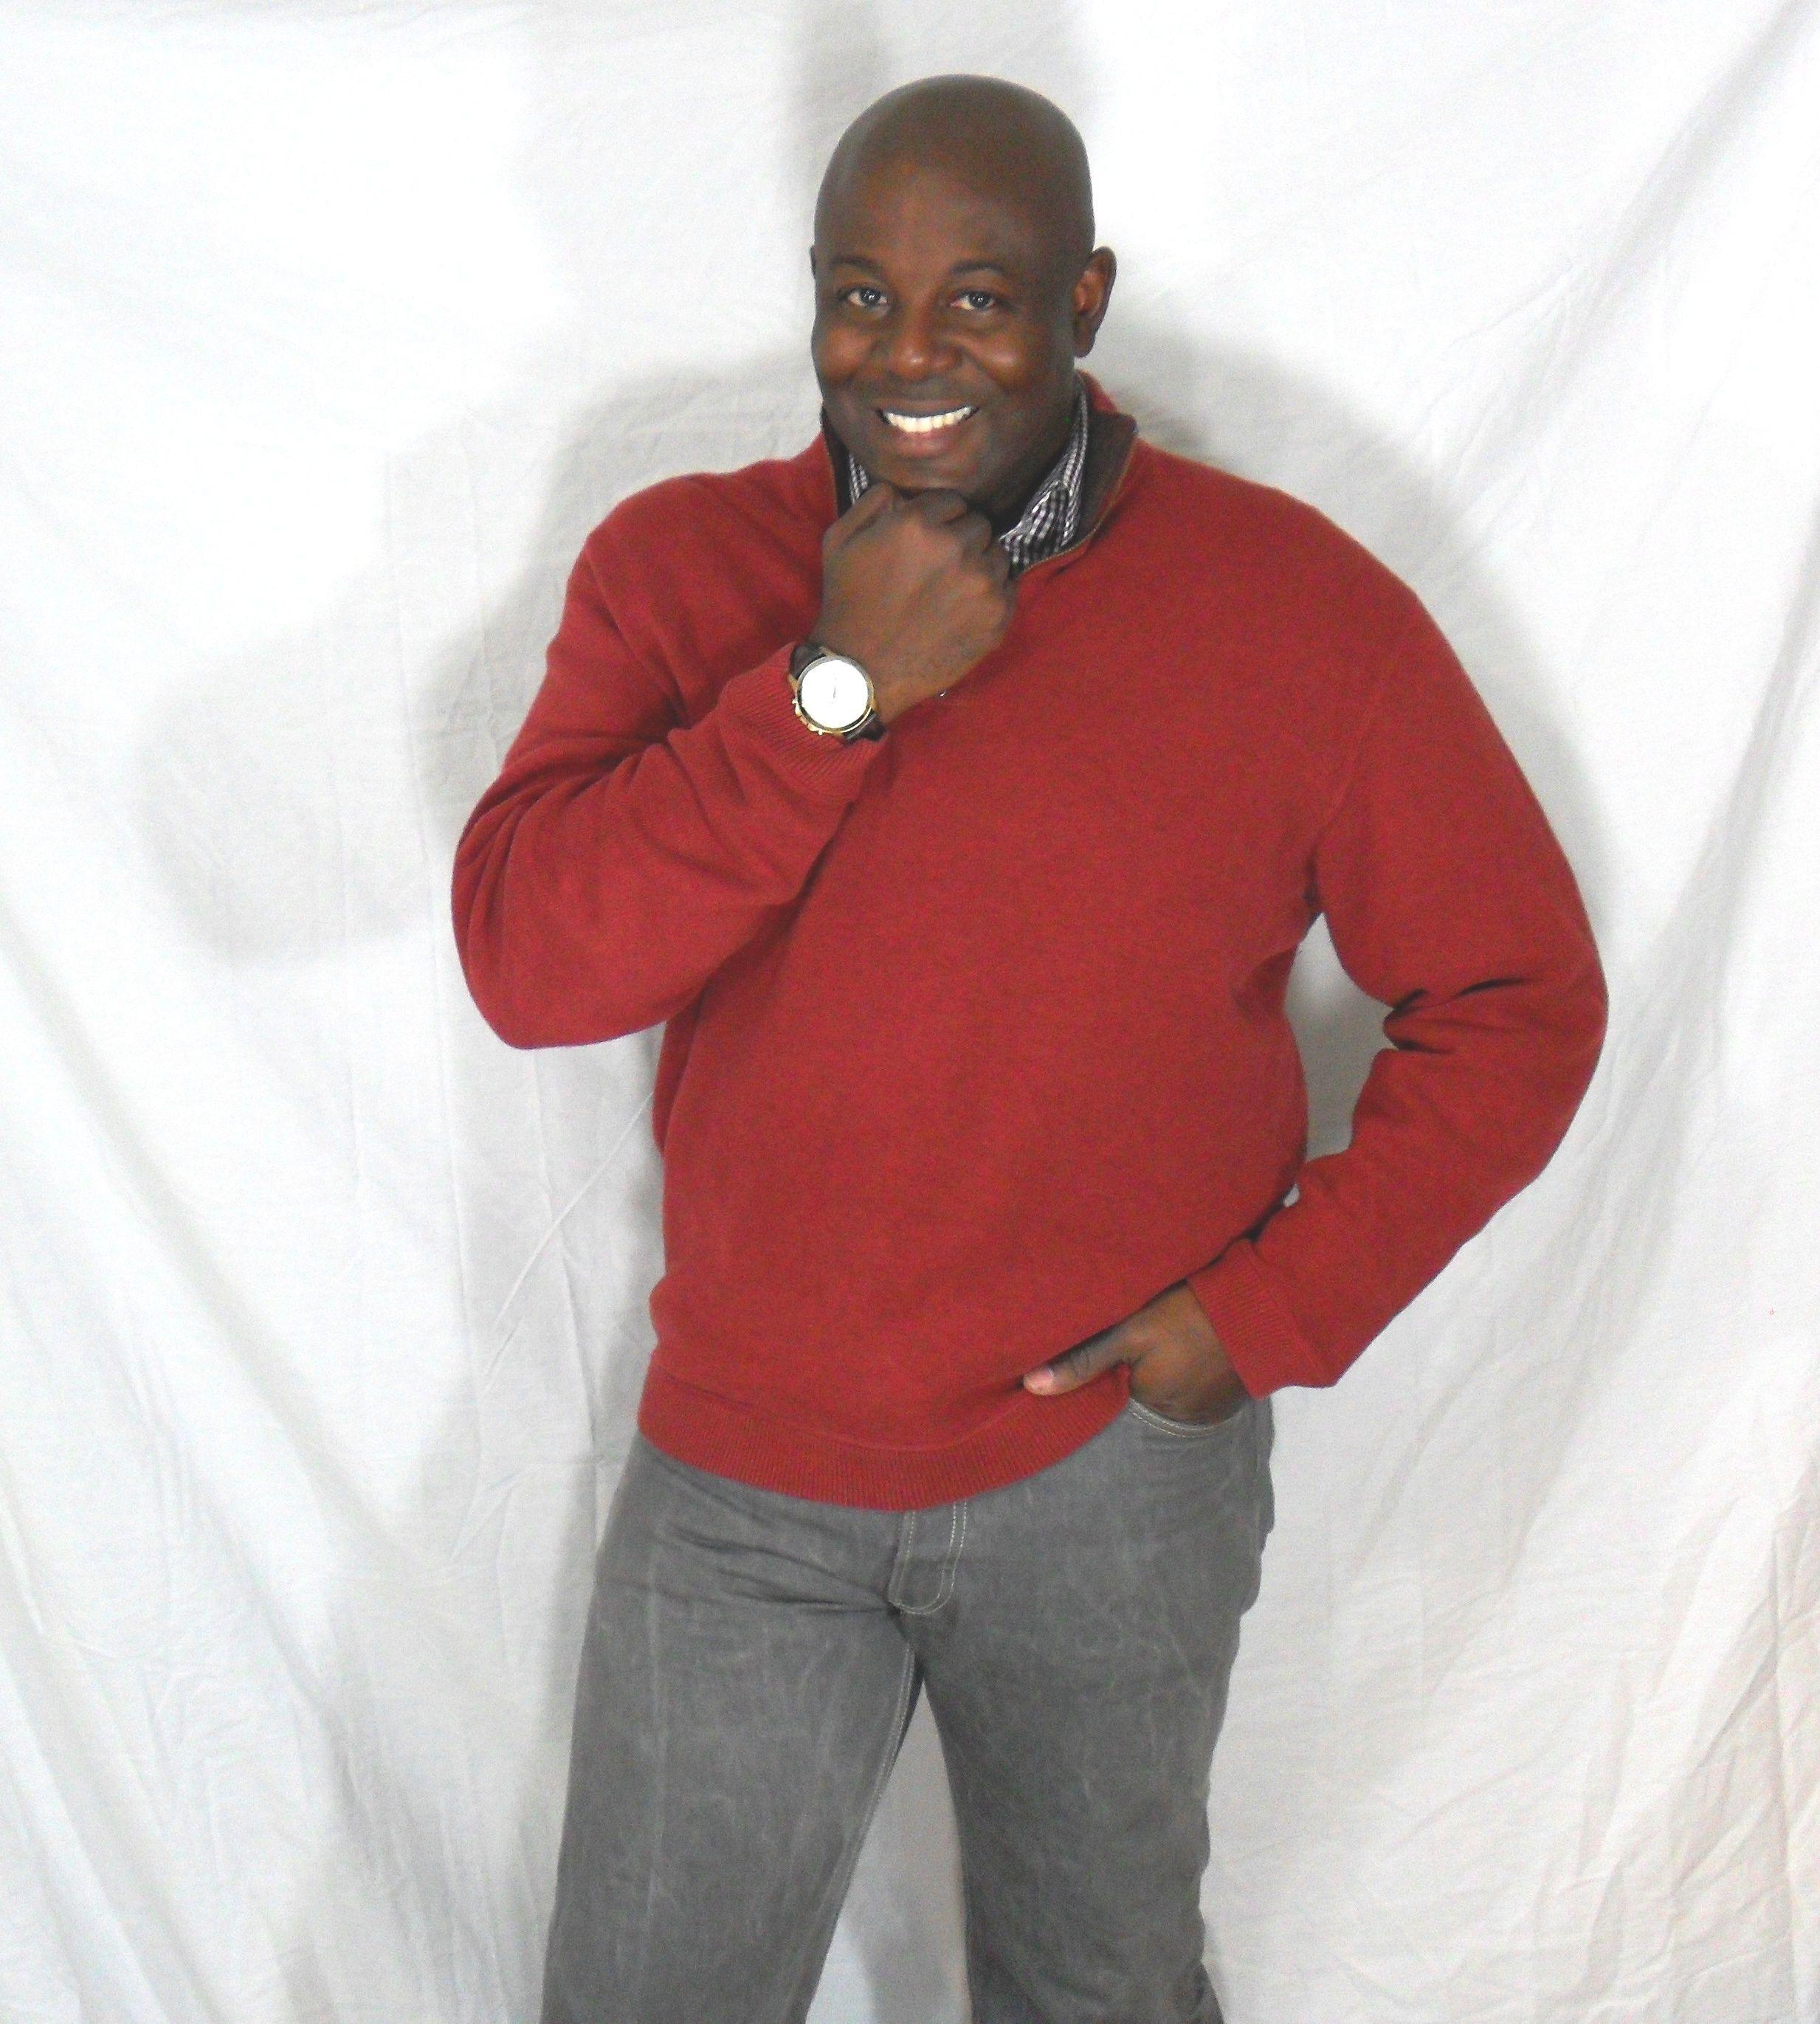 Red Sweater, red plad shirt, grey jeans | heartbreak | Pinterest ...